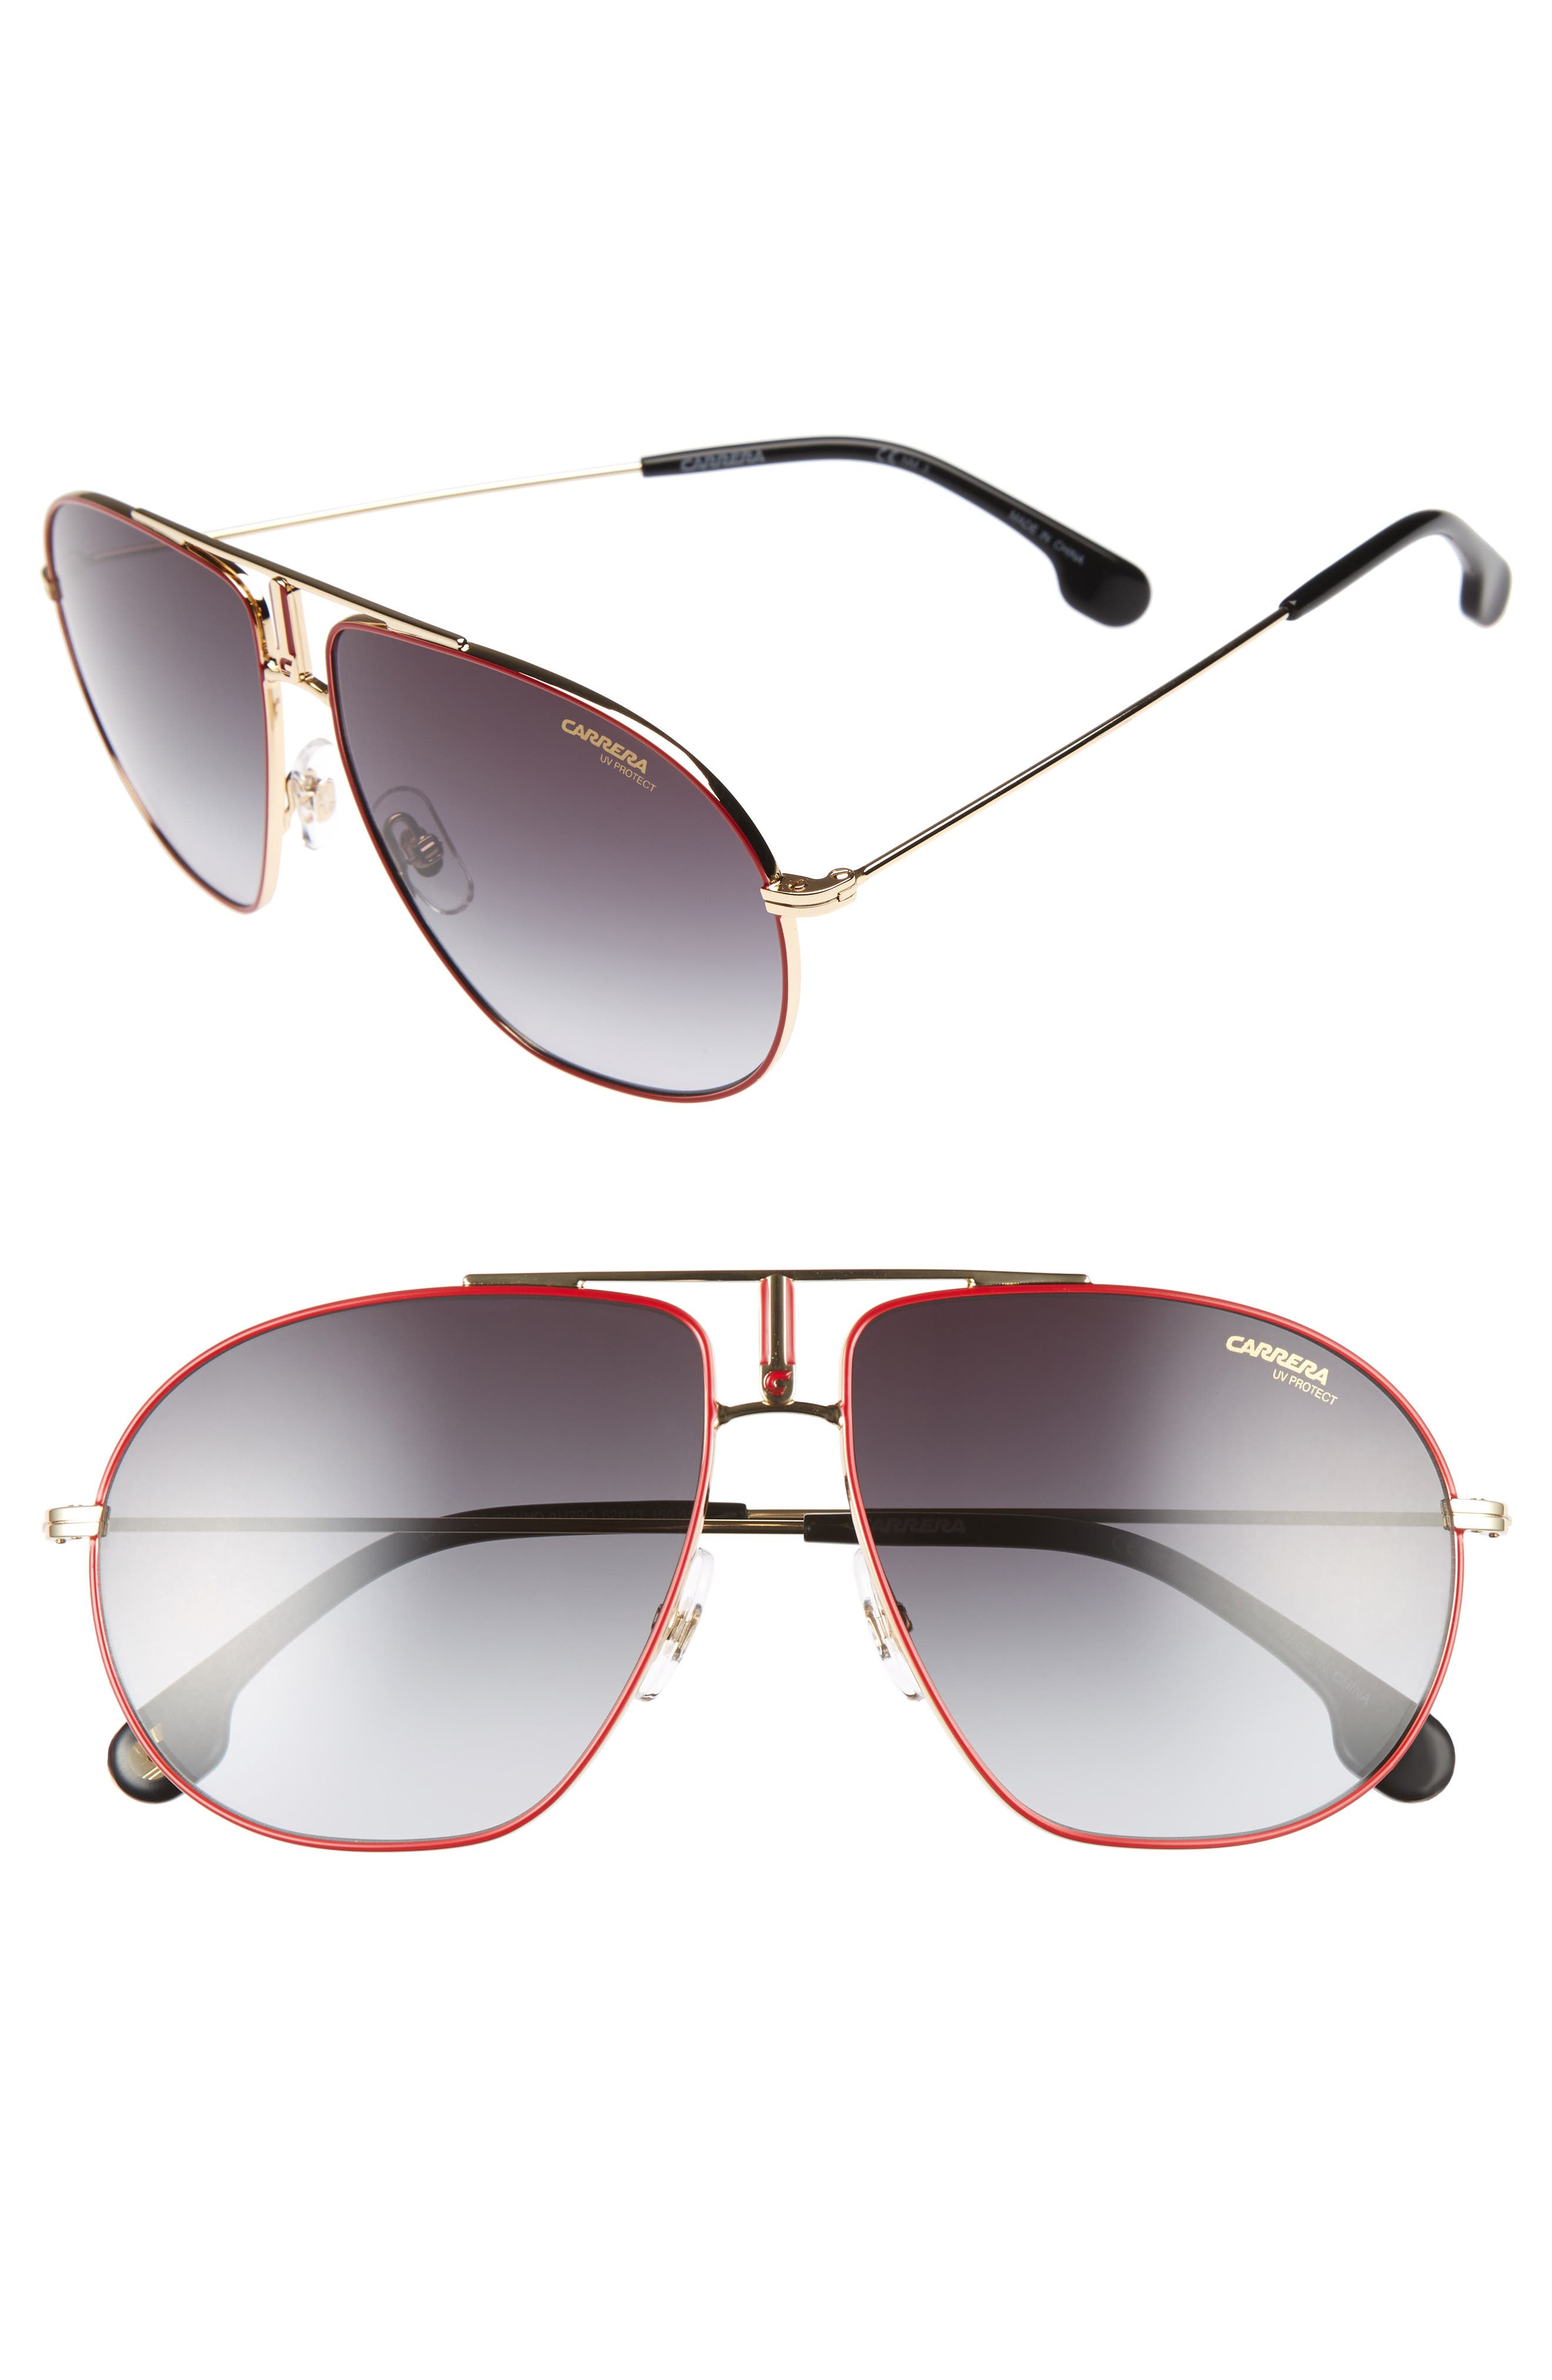 Carrera Bound 62Mm Sunglasses - Red Gold